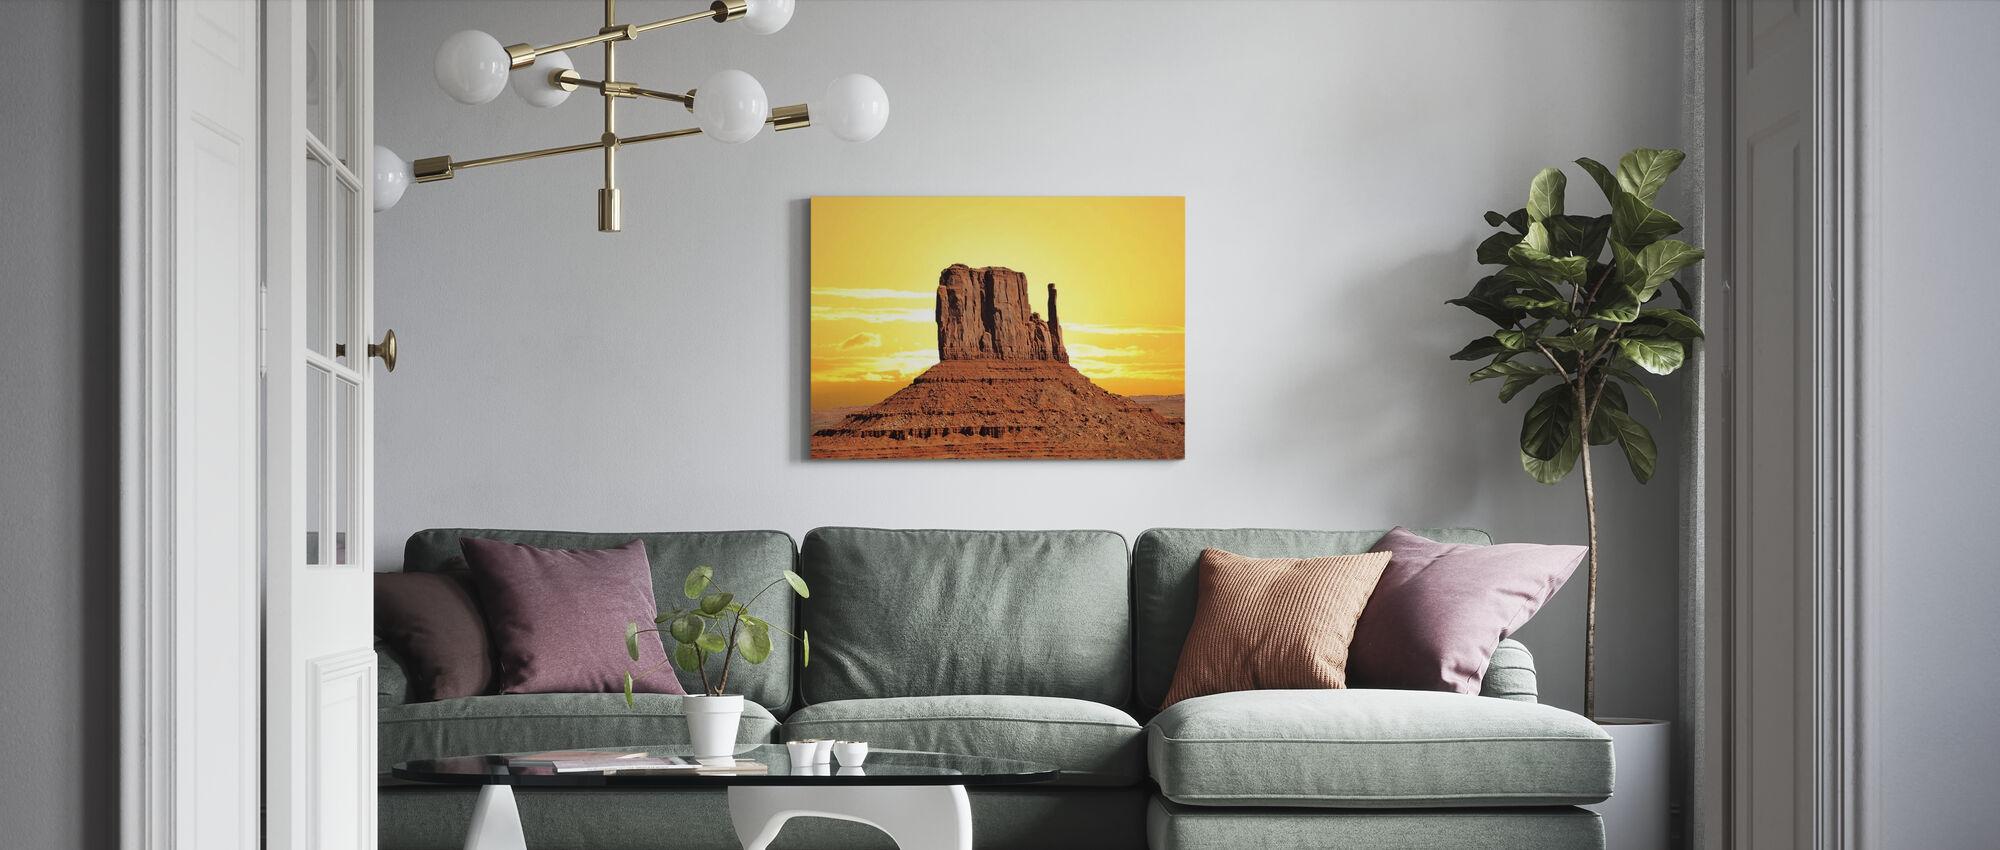 Roche Desert - Canvas print - Living Room